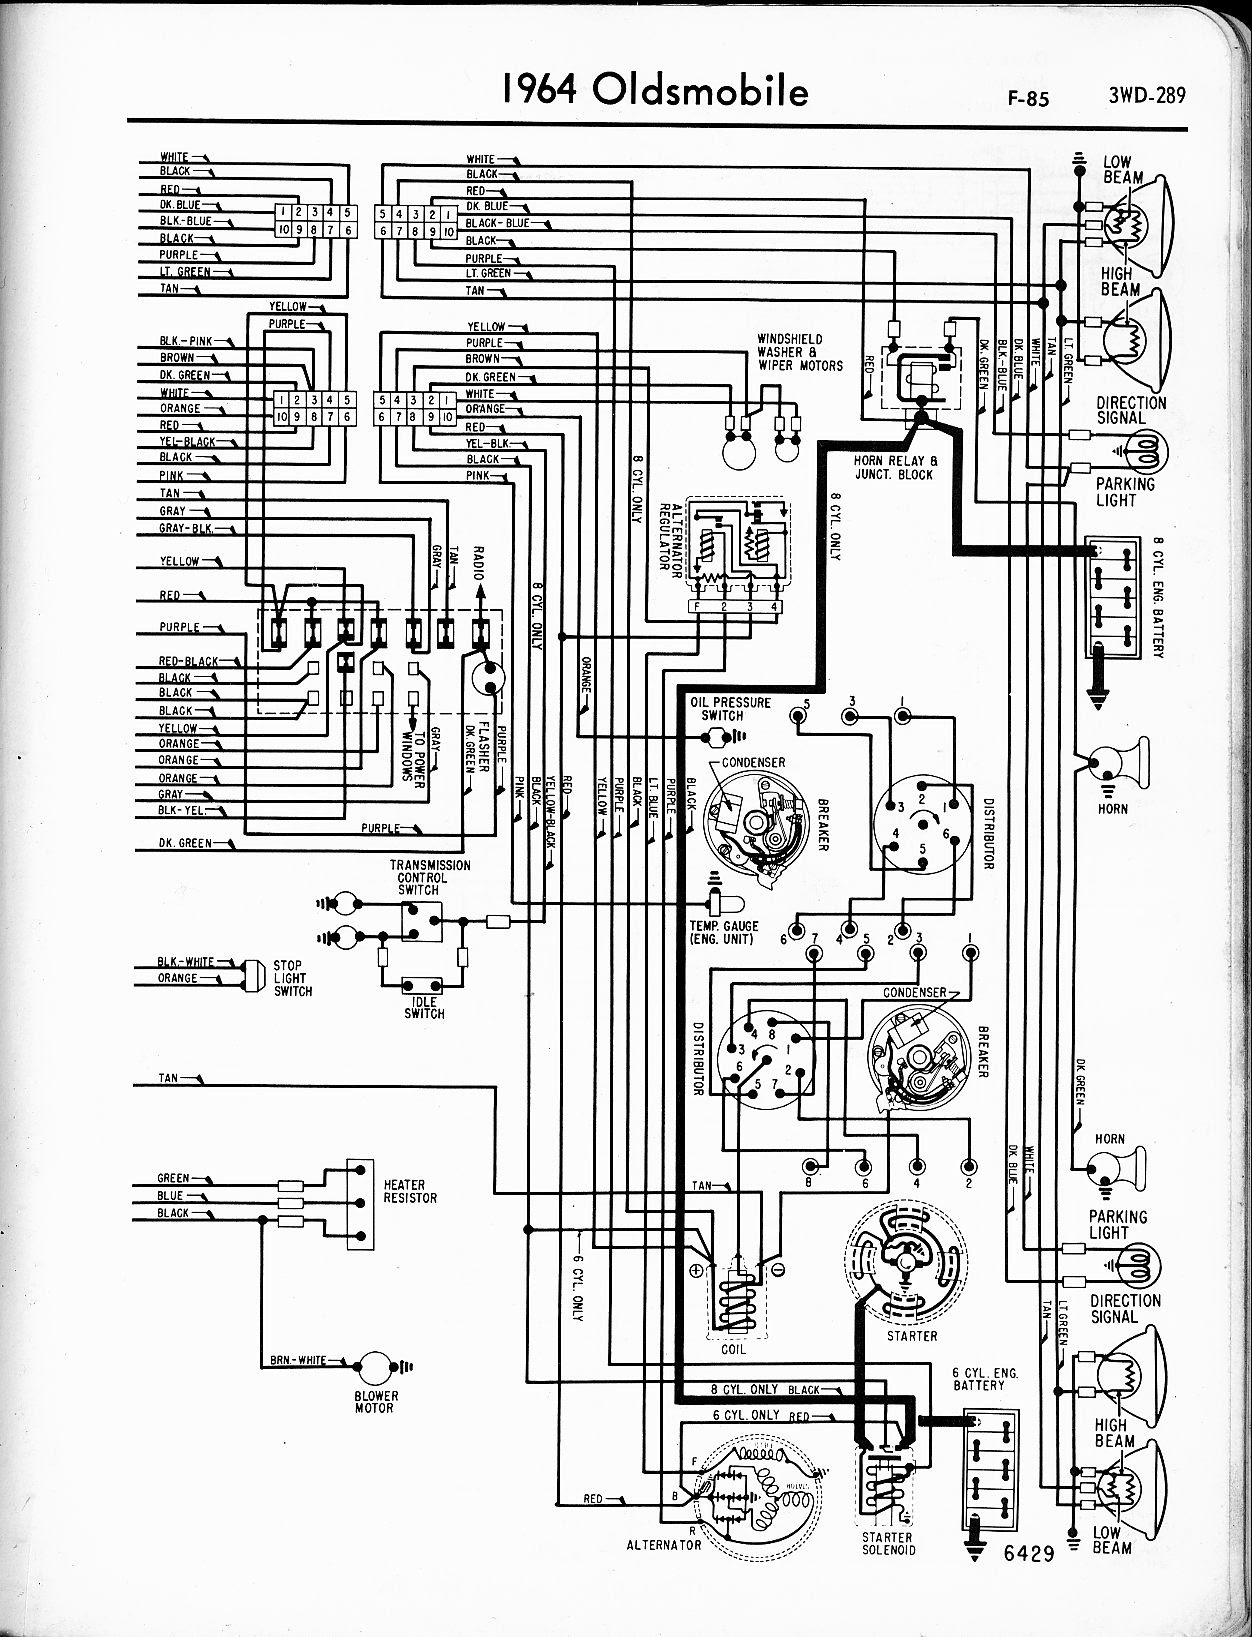 Oldsmobile Ignition Wiring Diagram Wiring Diagram Modernize Modernize Frankmotors Es